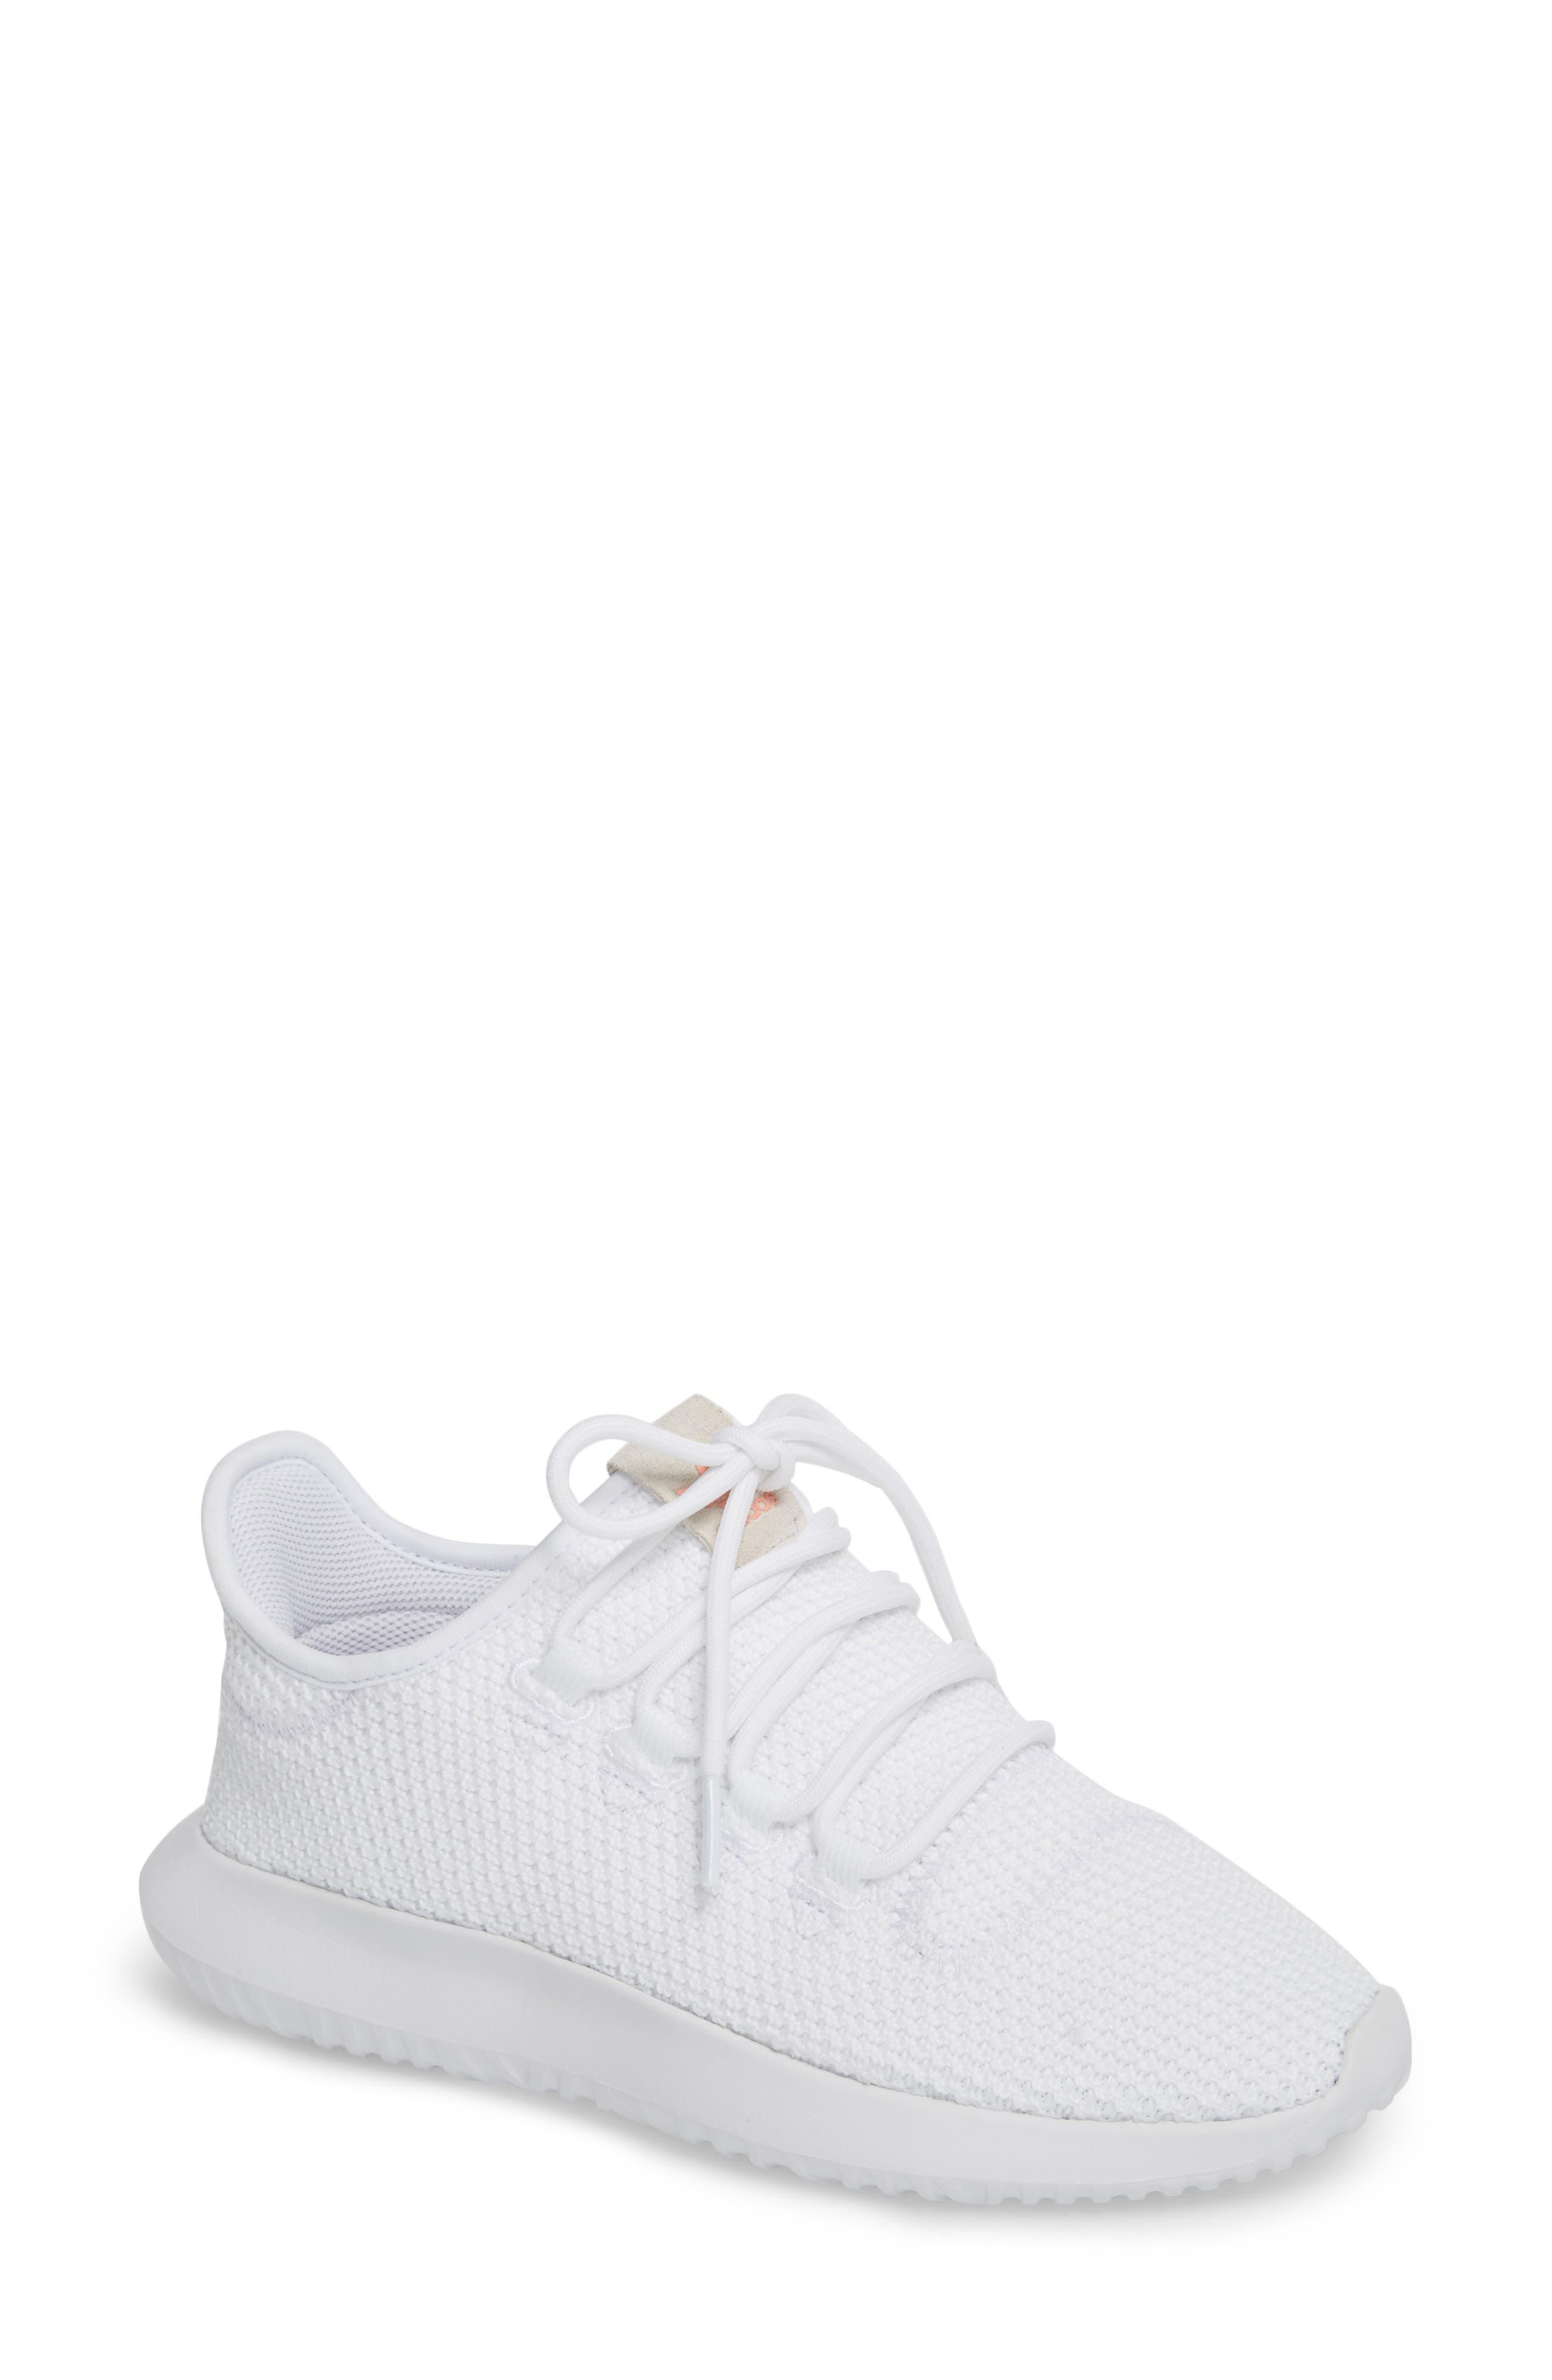 Tubular Shadow Sneaker,                         Main,                         color, White/ White/ Core Black